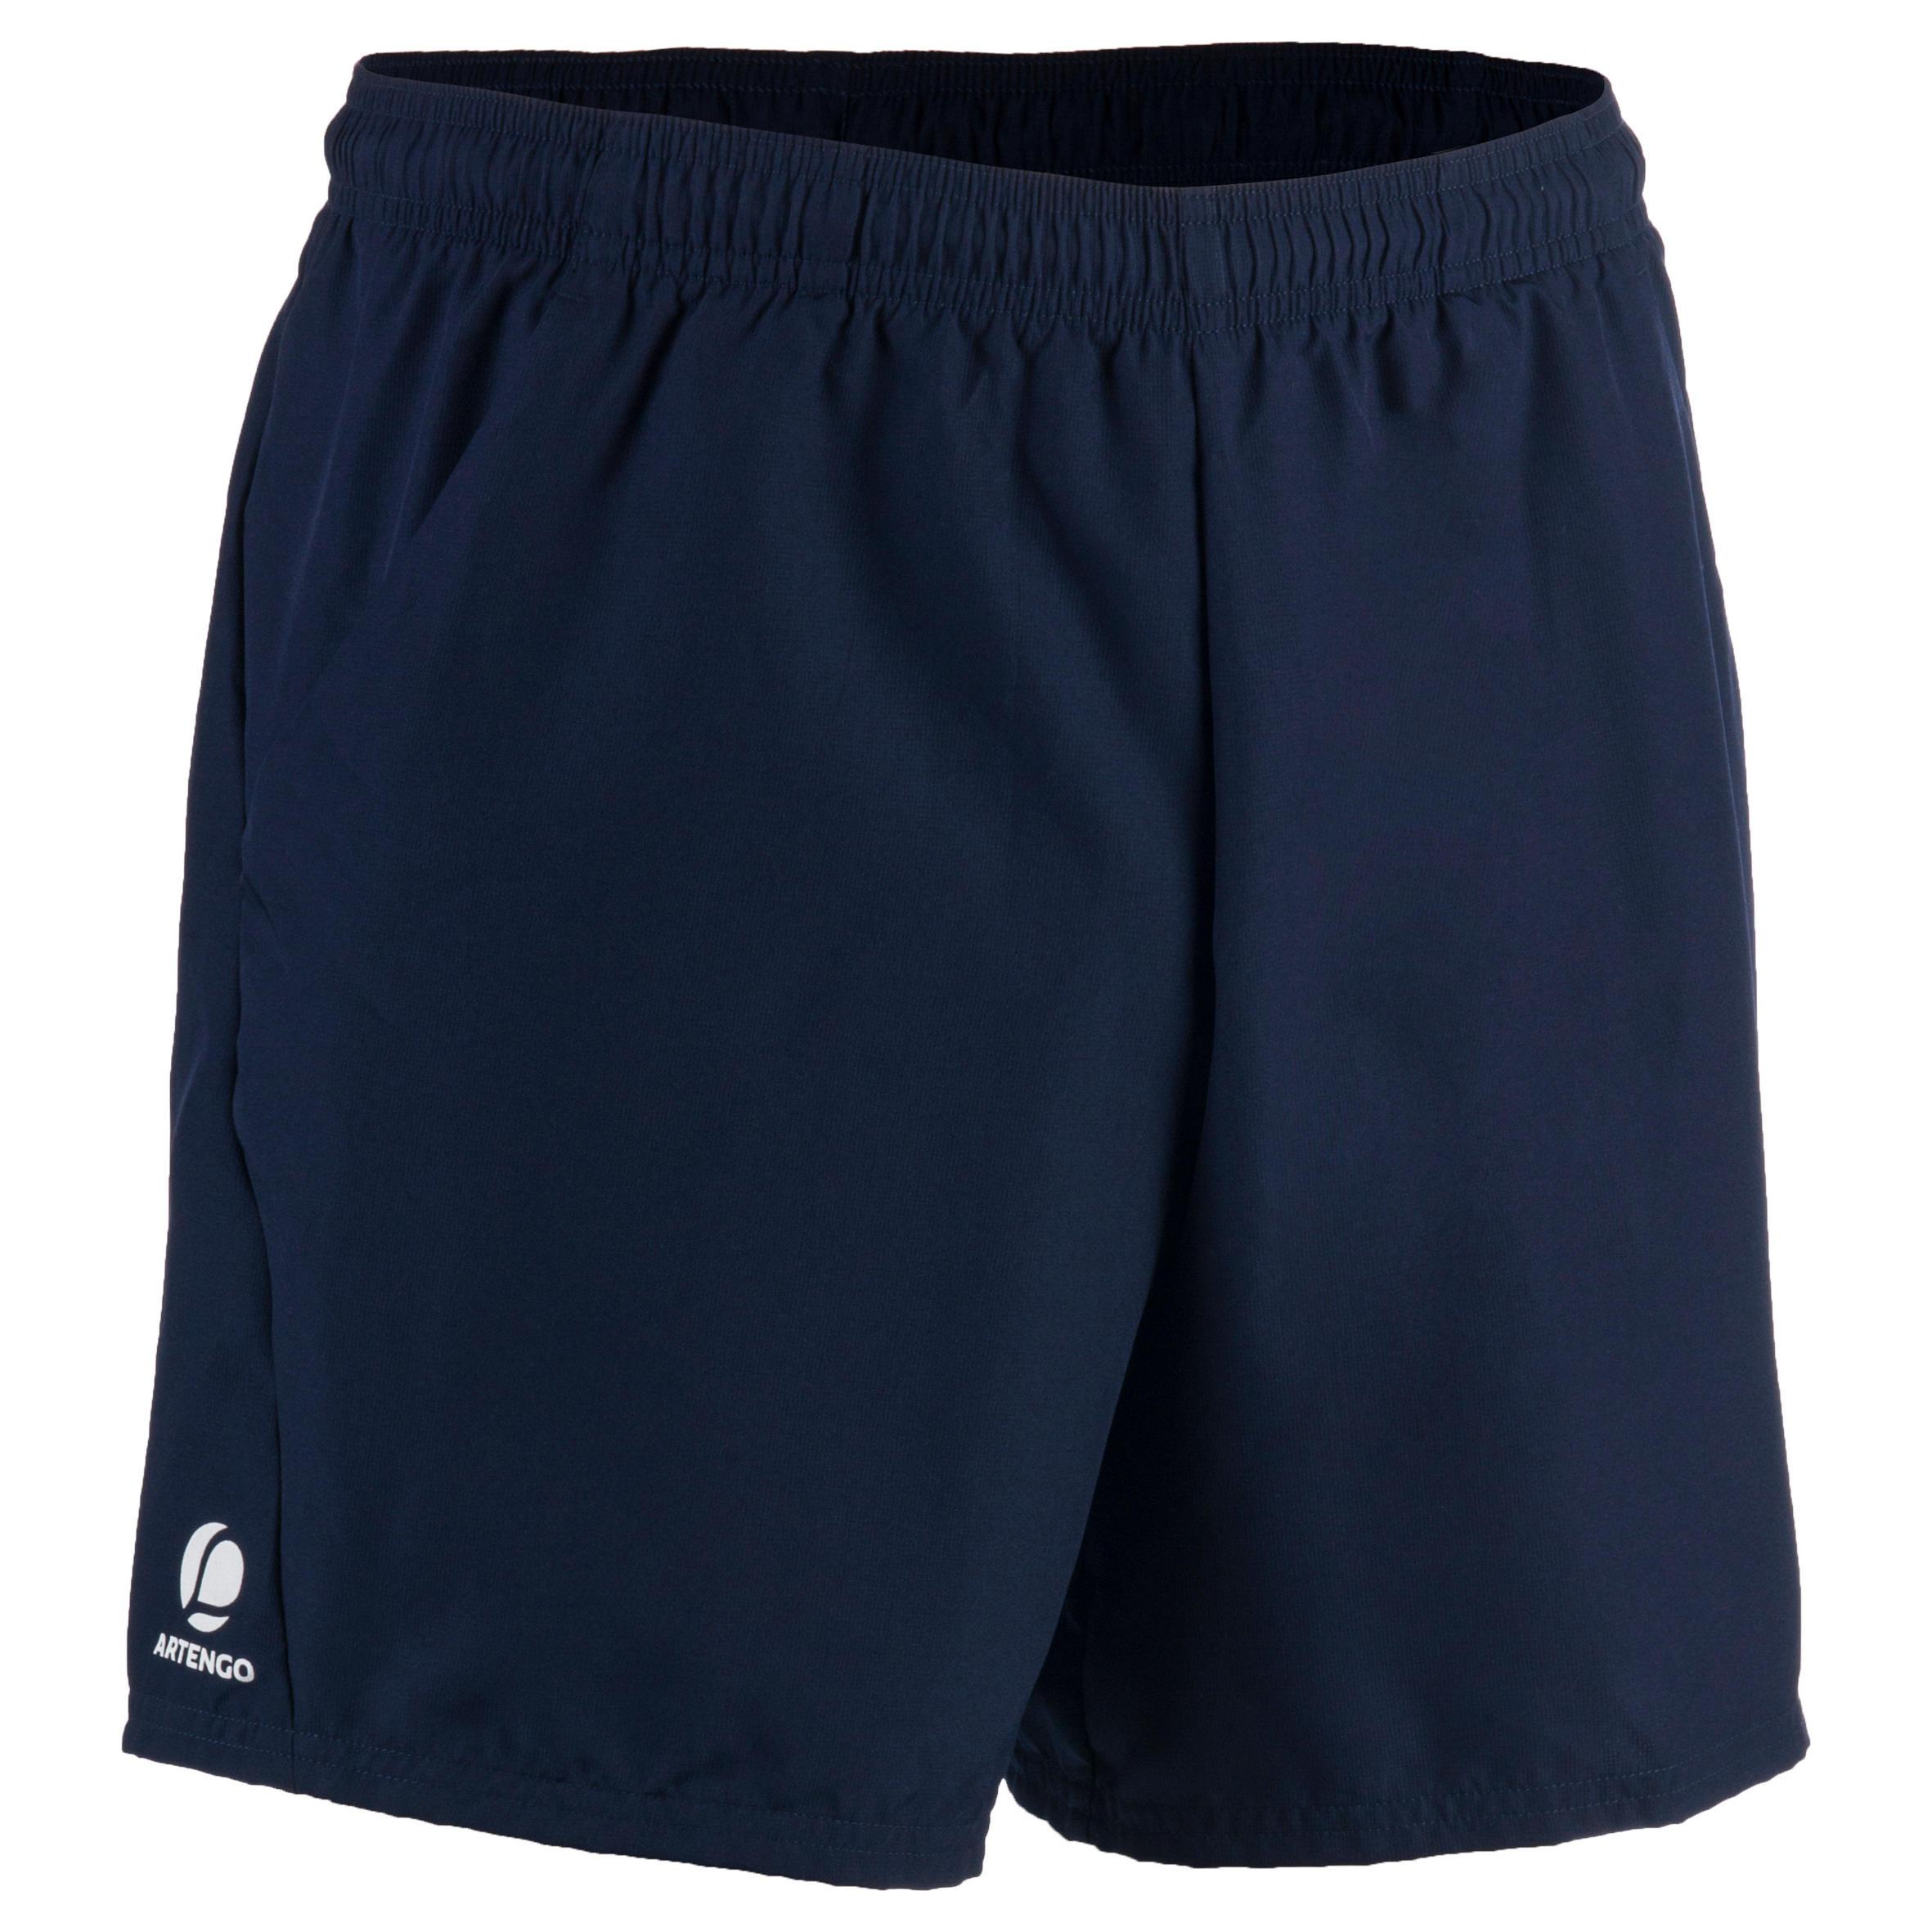 Dry 100 Tennis Shorts - Navy Blue